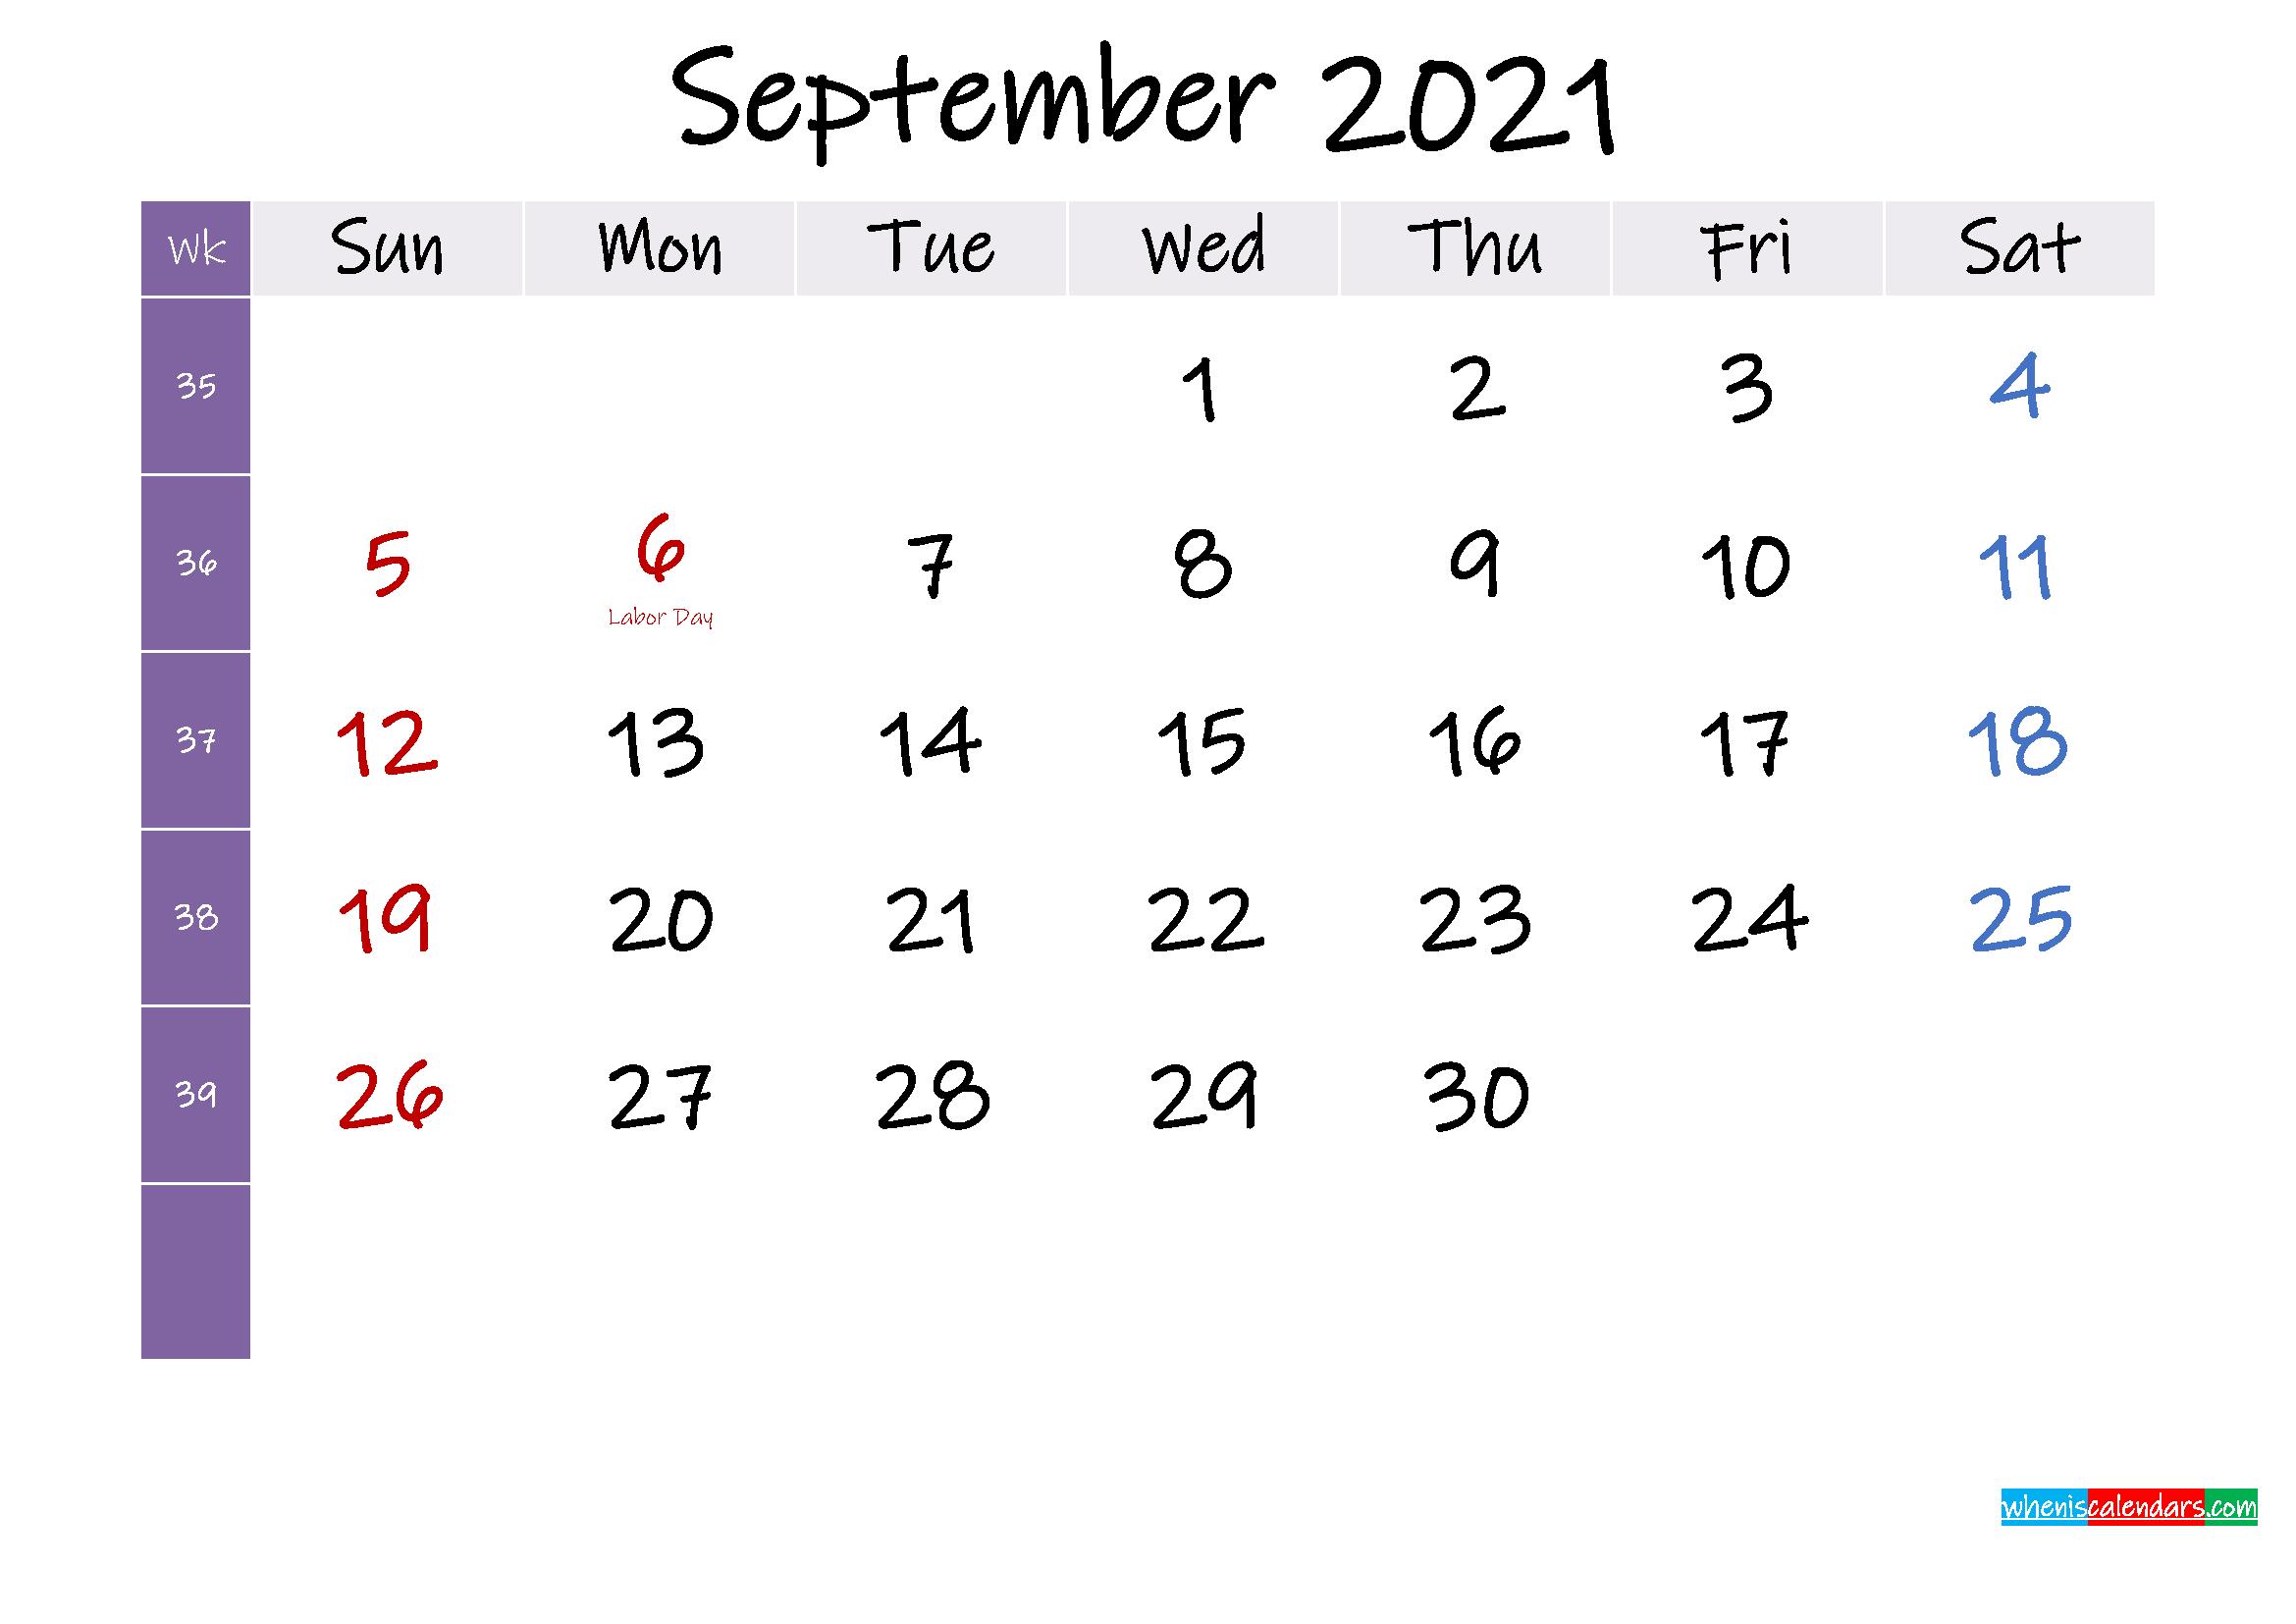 September 2021 Free Printable Calendar with Holidays